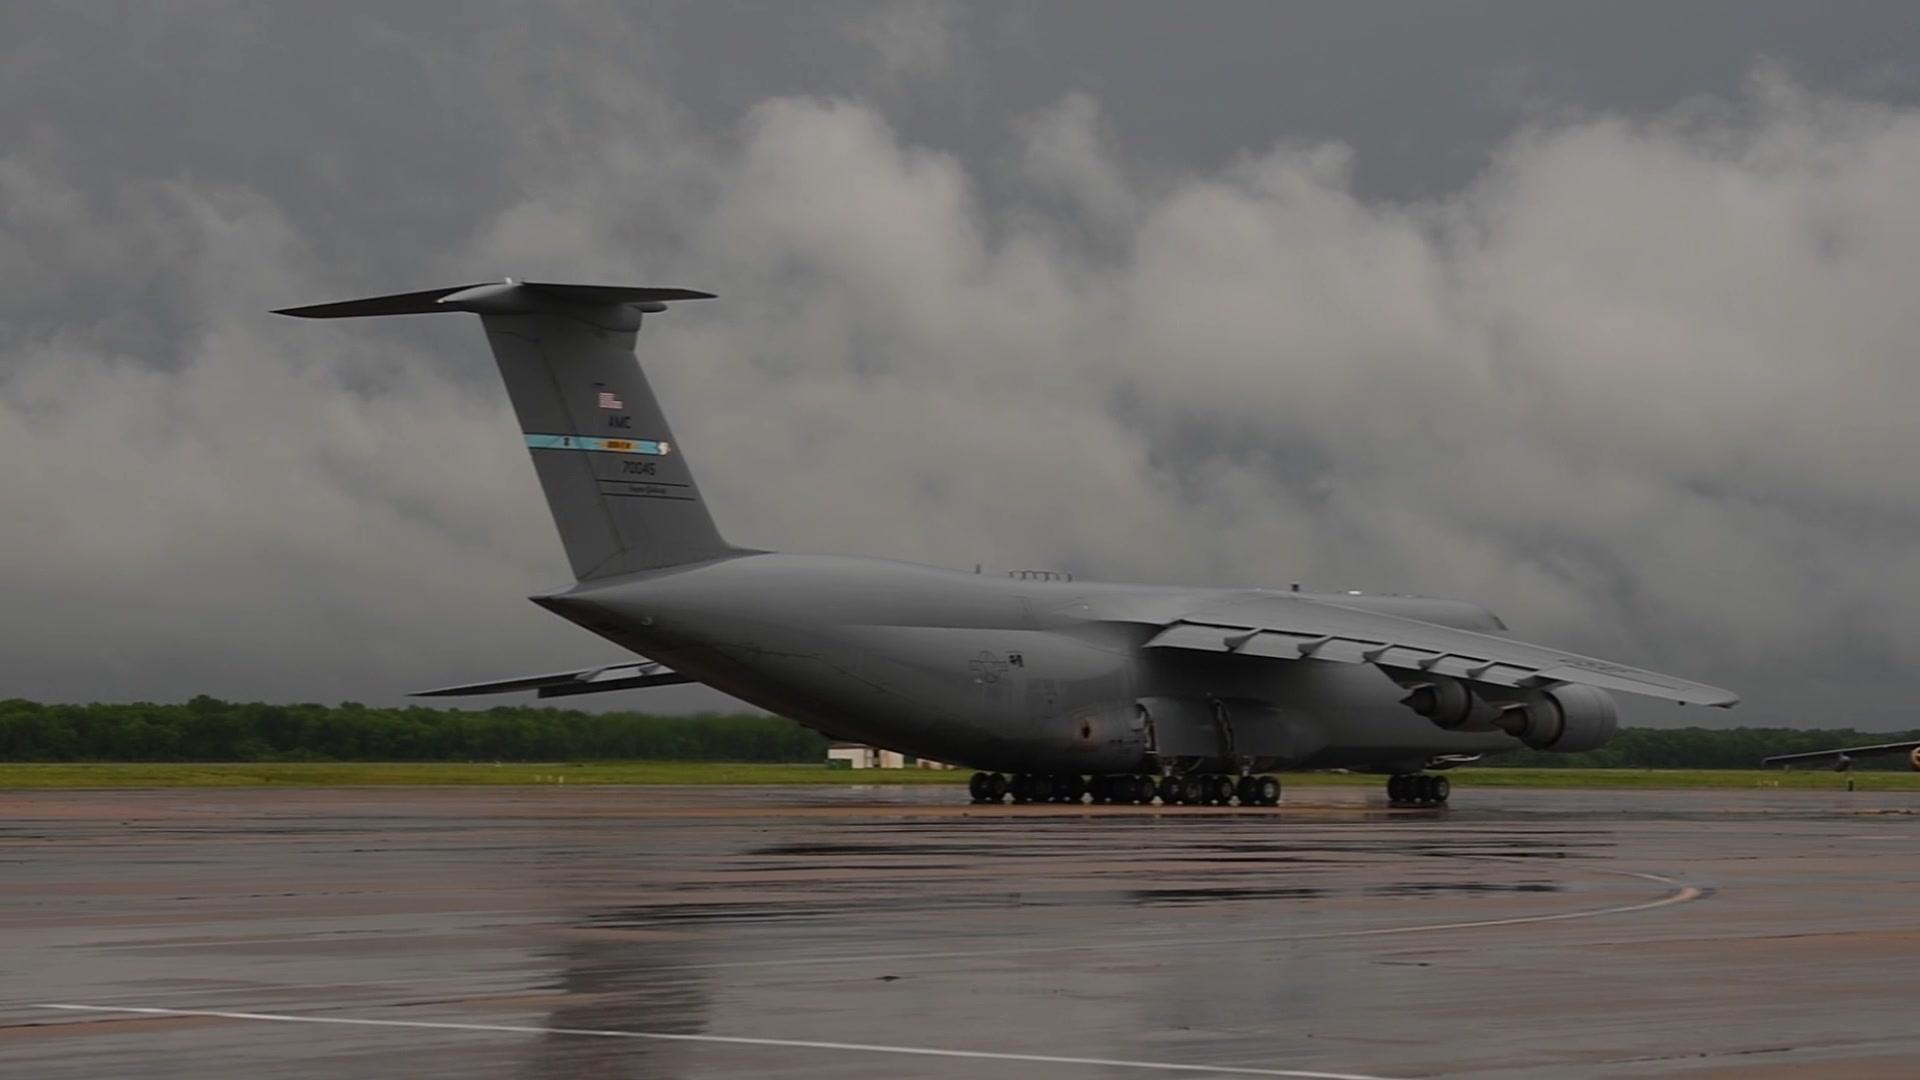 US AIR FORCE USAF Delta II Launch Vehicle NAVSTAR GPS DD 8X12 PHOTOGRAPH